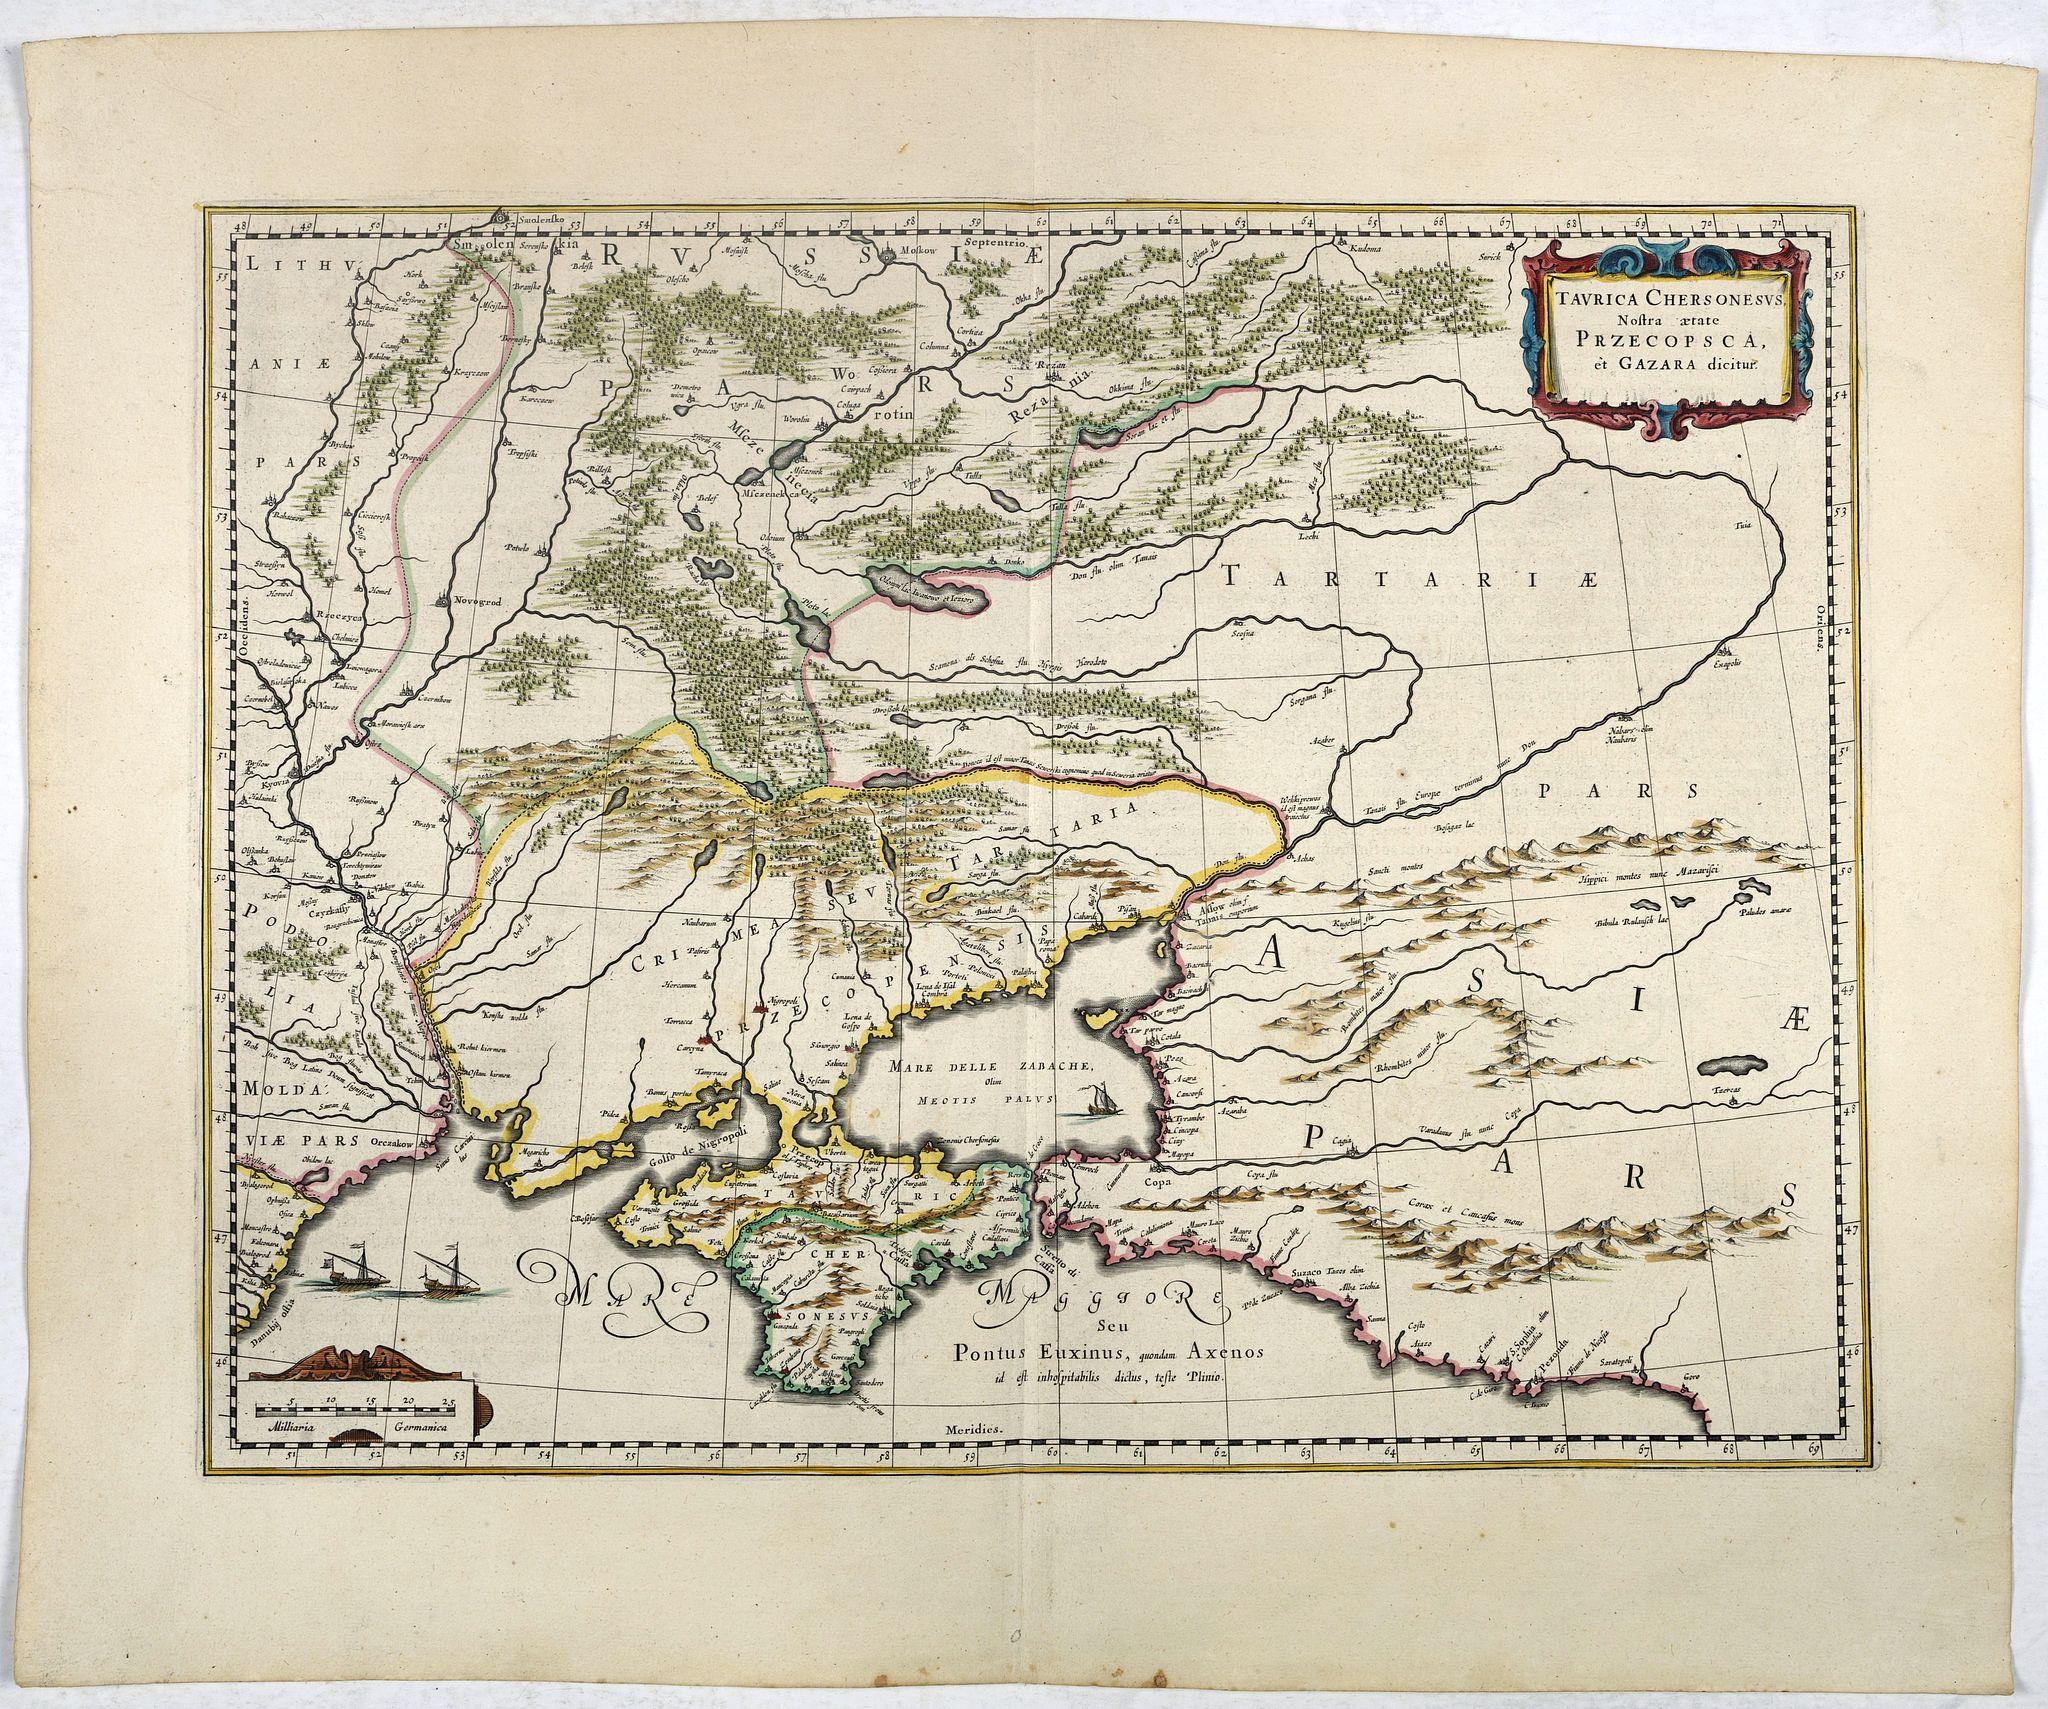 BLAEU, W. -  Taurica Chersonesus, Nostra aetate Przecopsca, et Gazara dicitur.